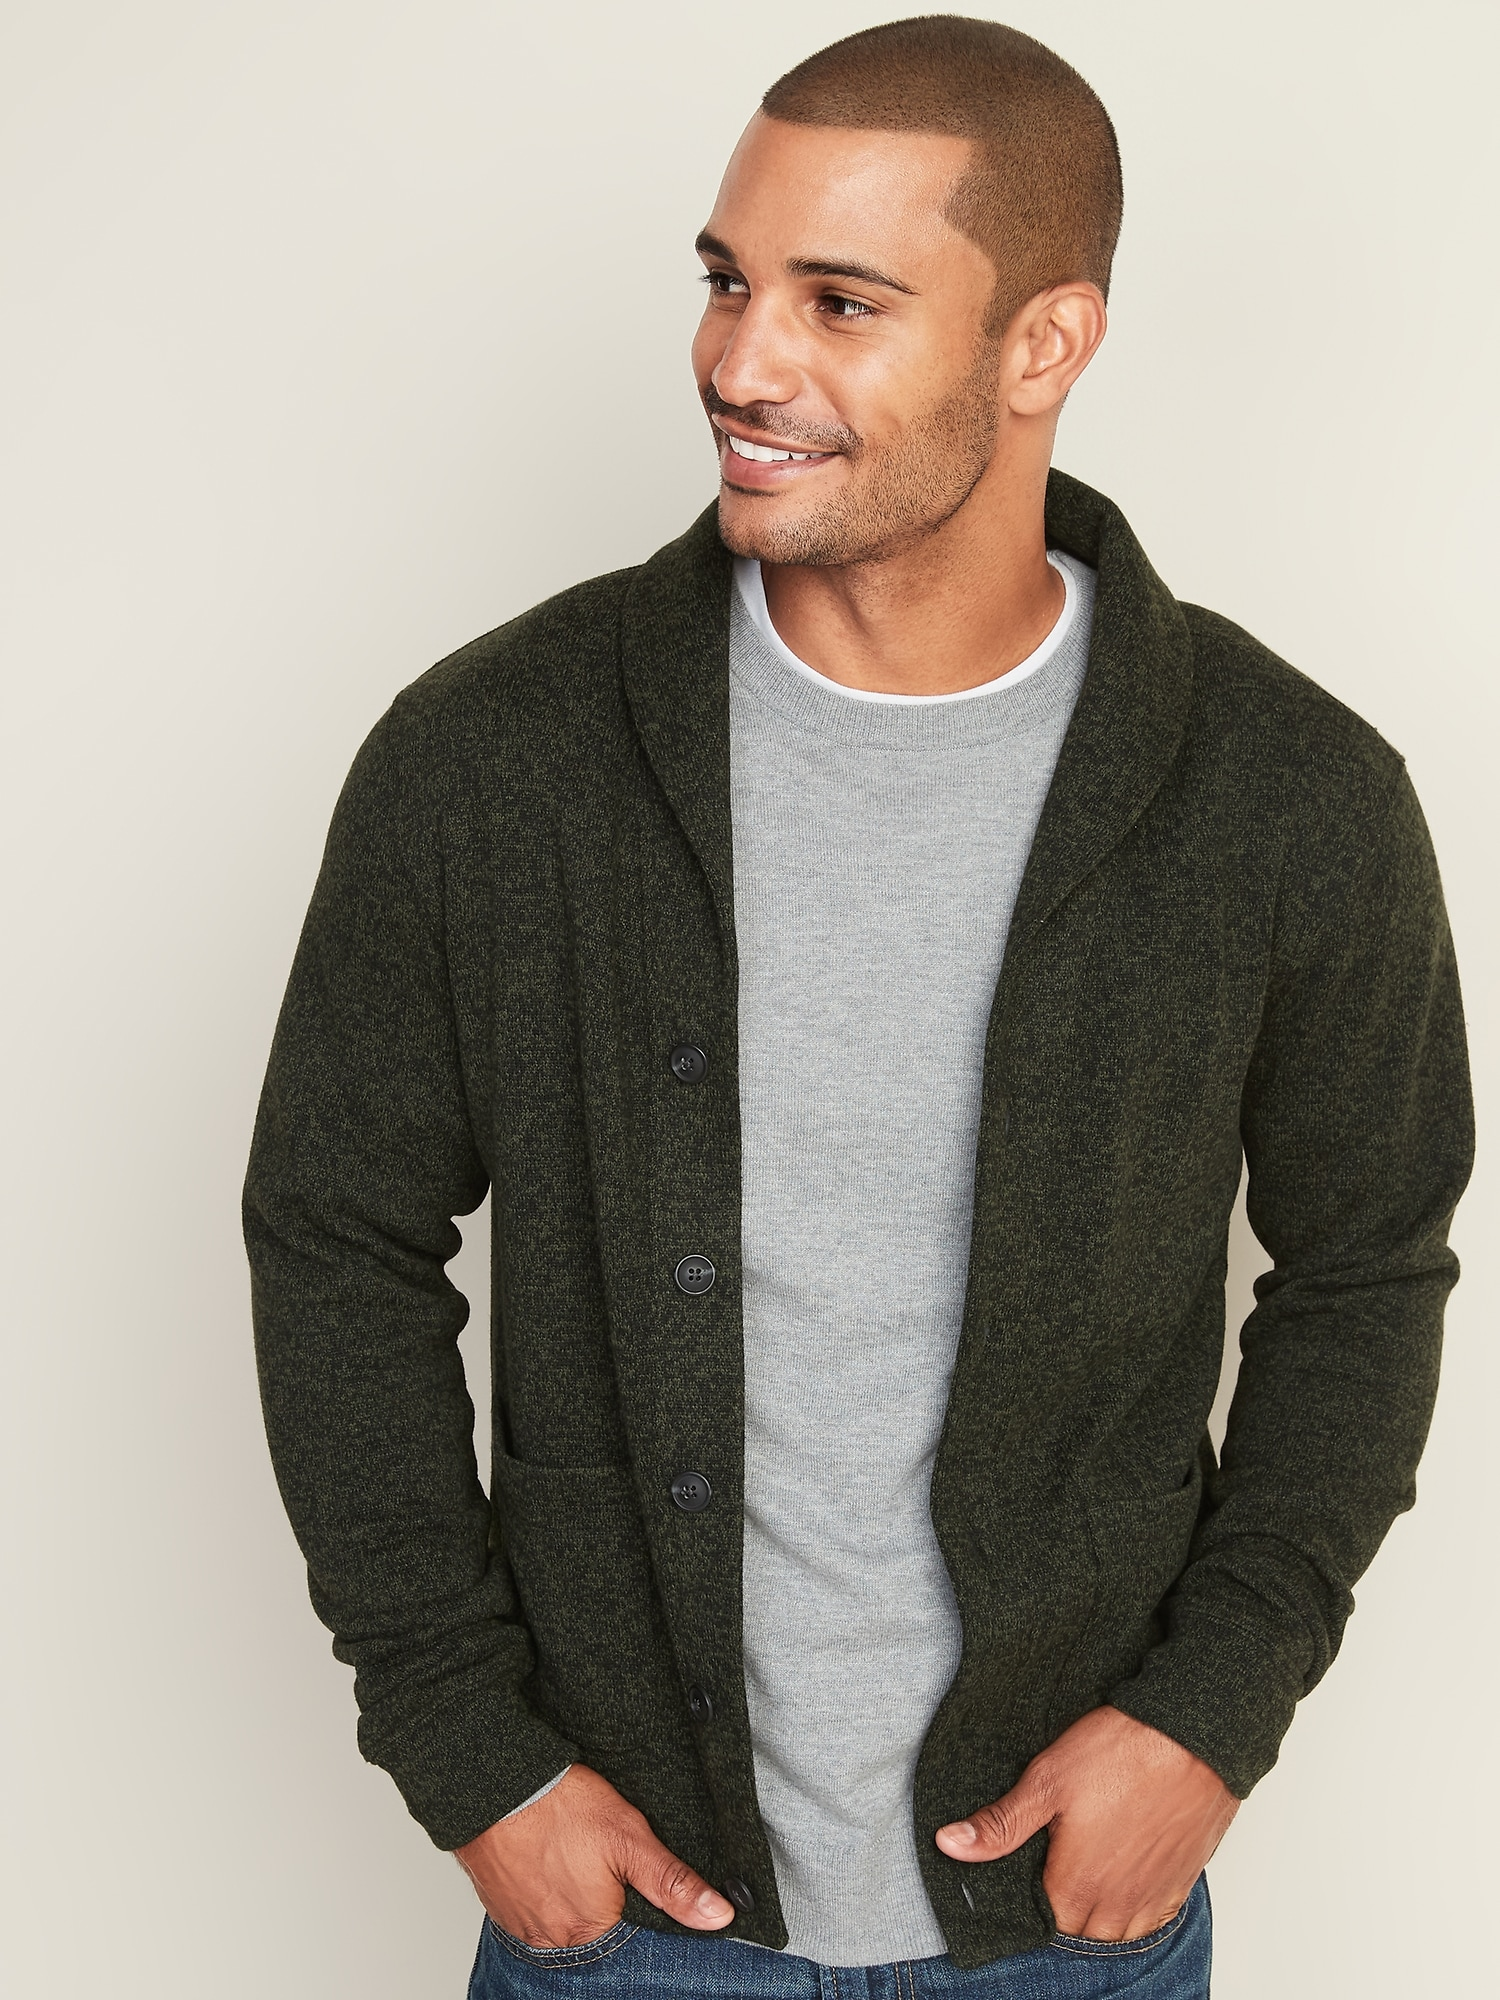 Shawl,Collar Button,Front Sweater,Fleece Cardigan for Men